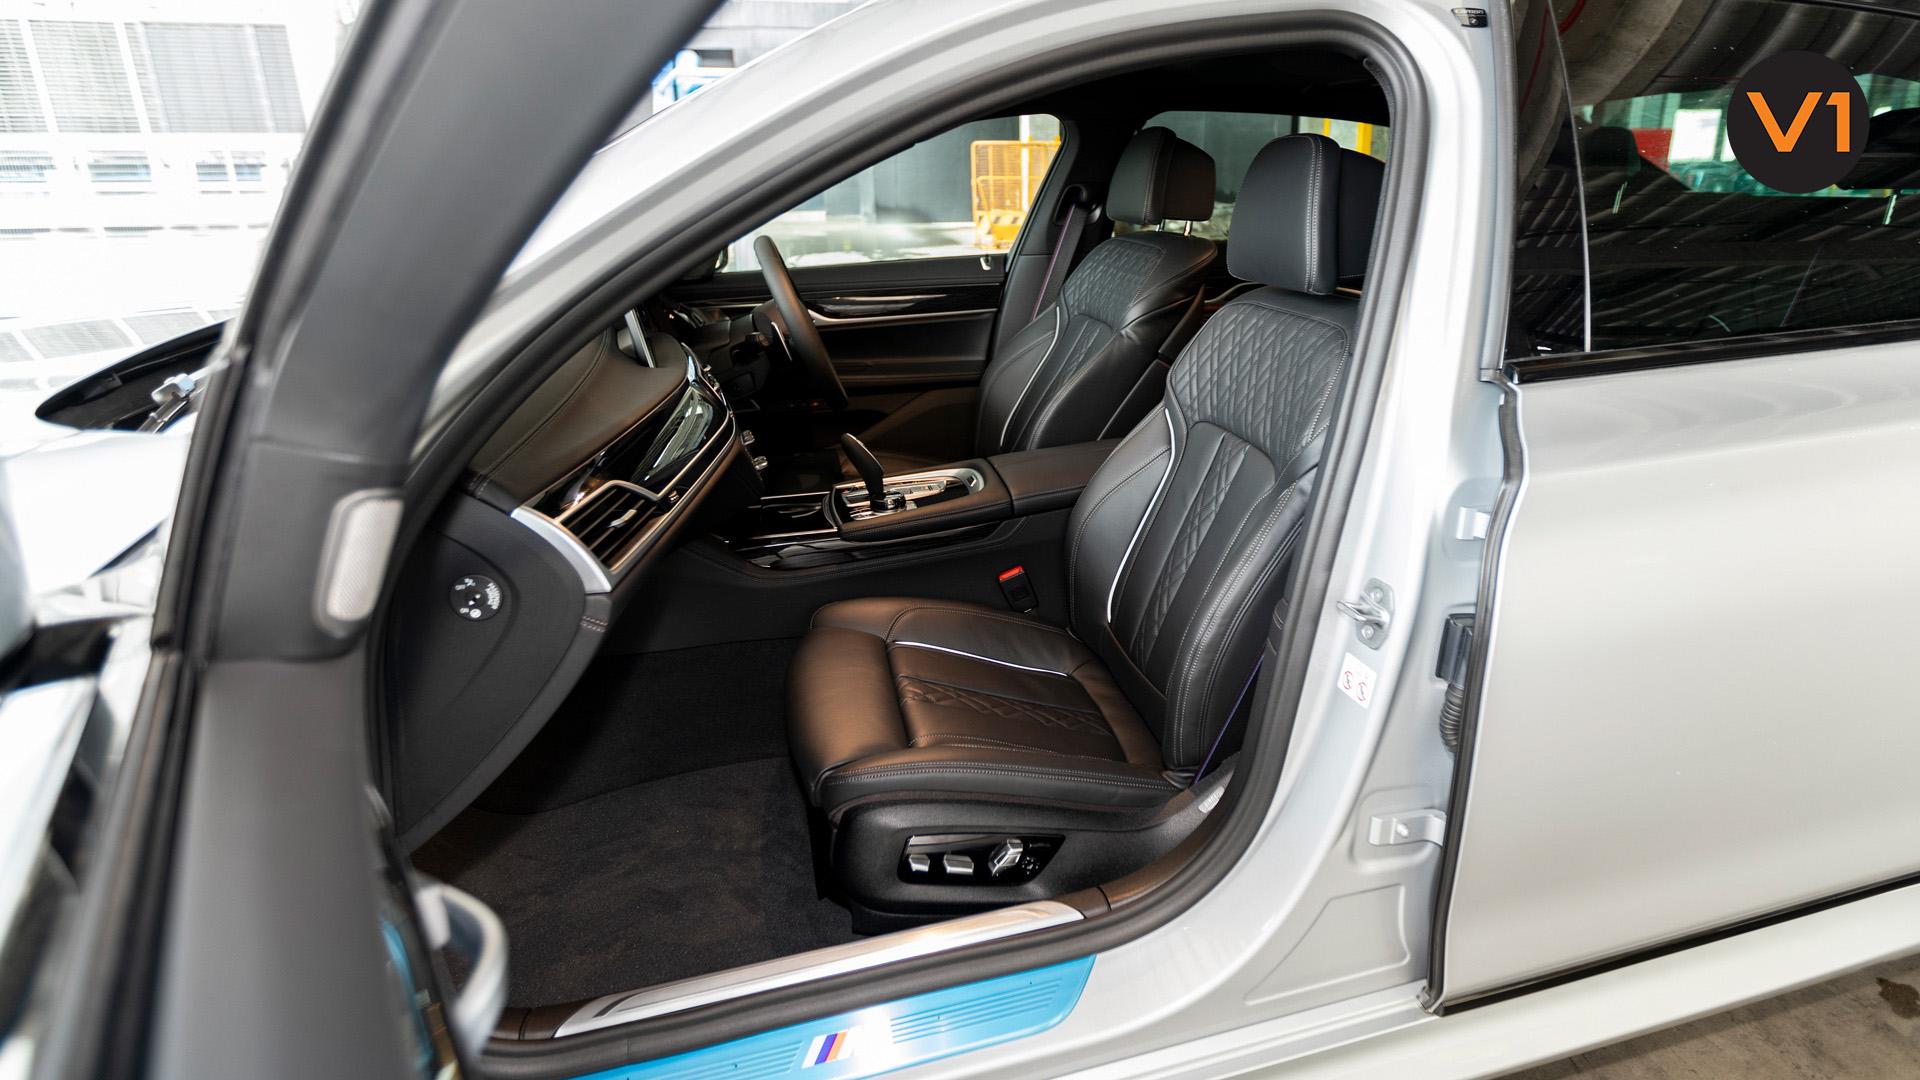 BMW 740LI M Sport Saloon - Front Passenger Seat